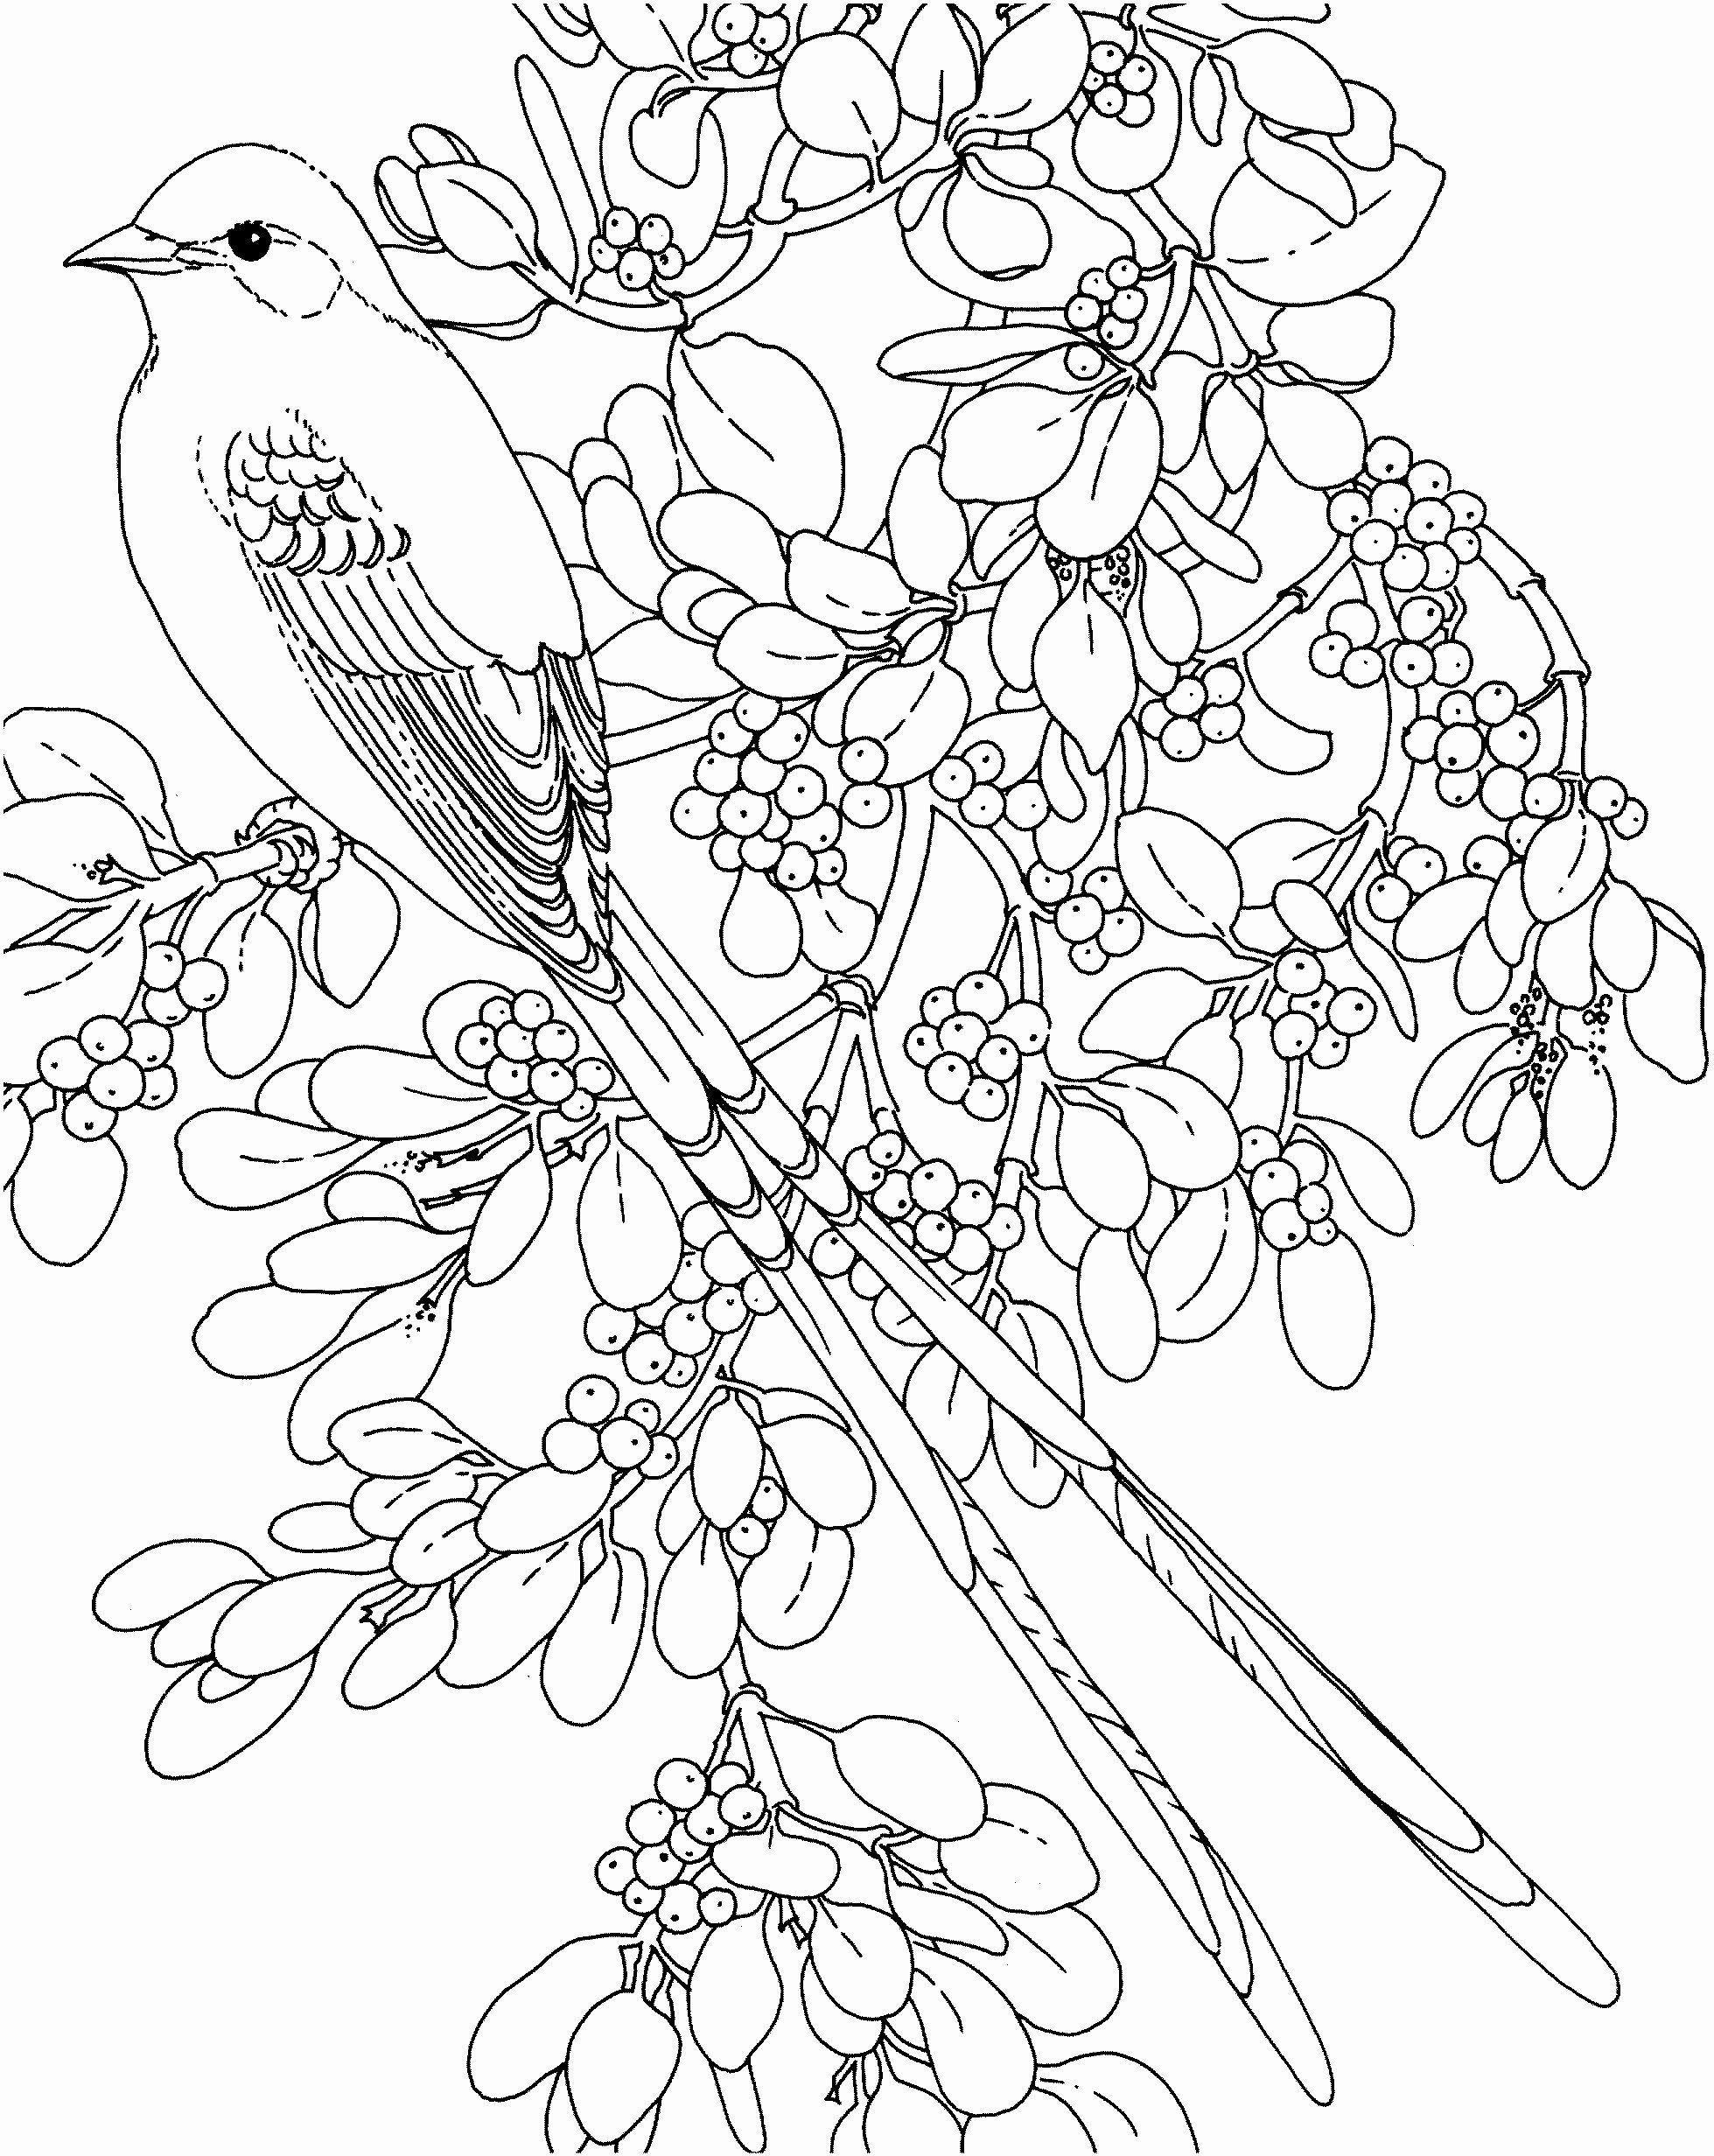 Coloring Fall Tree Elegant Sassafras Tree Coloring Pages Coloring Elegant Fall Coloring Eleg In 2020 Bird Coloring Pages Flower Coloring Pages Tree Coloring Page [ 2464 x 1959 Pixel ]